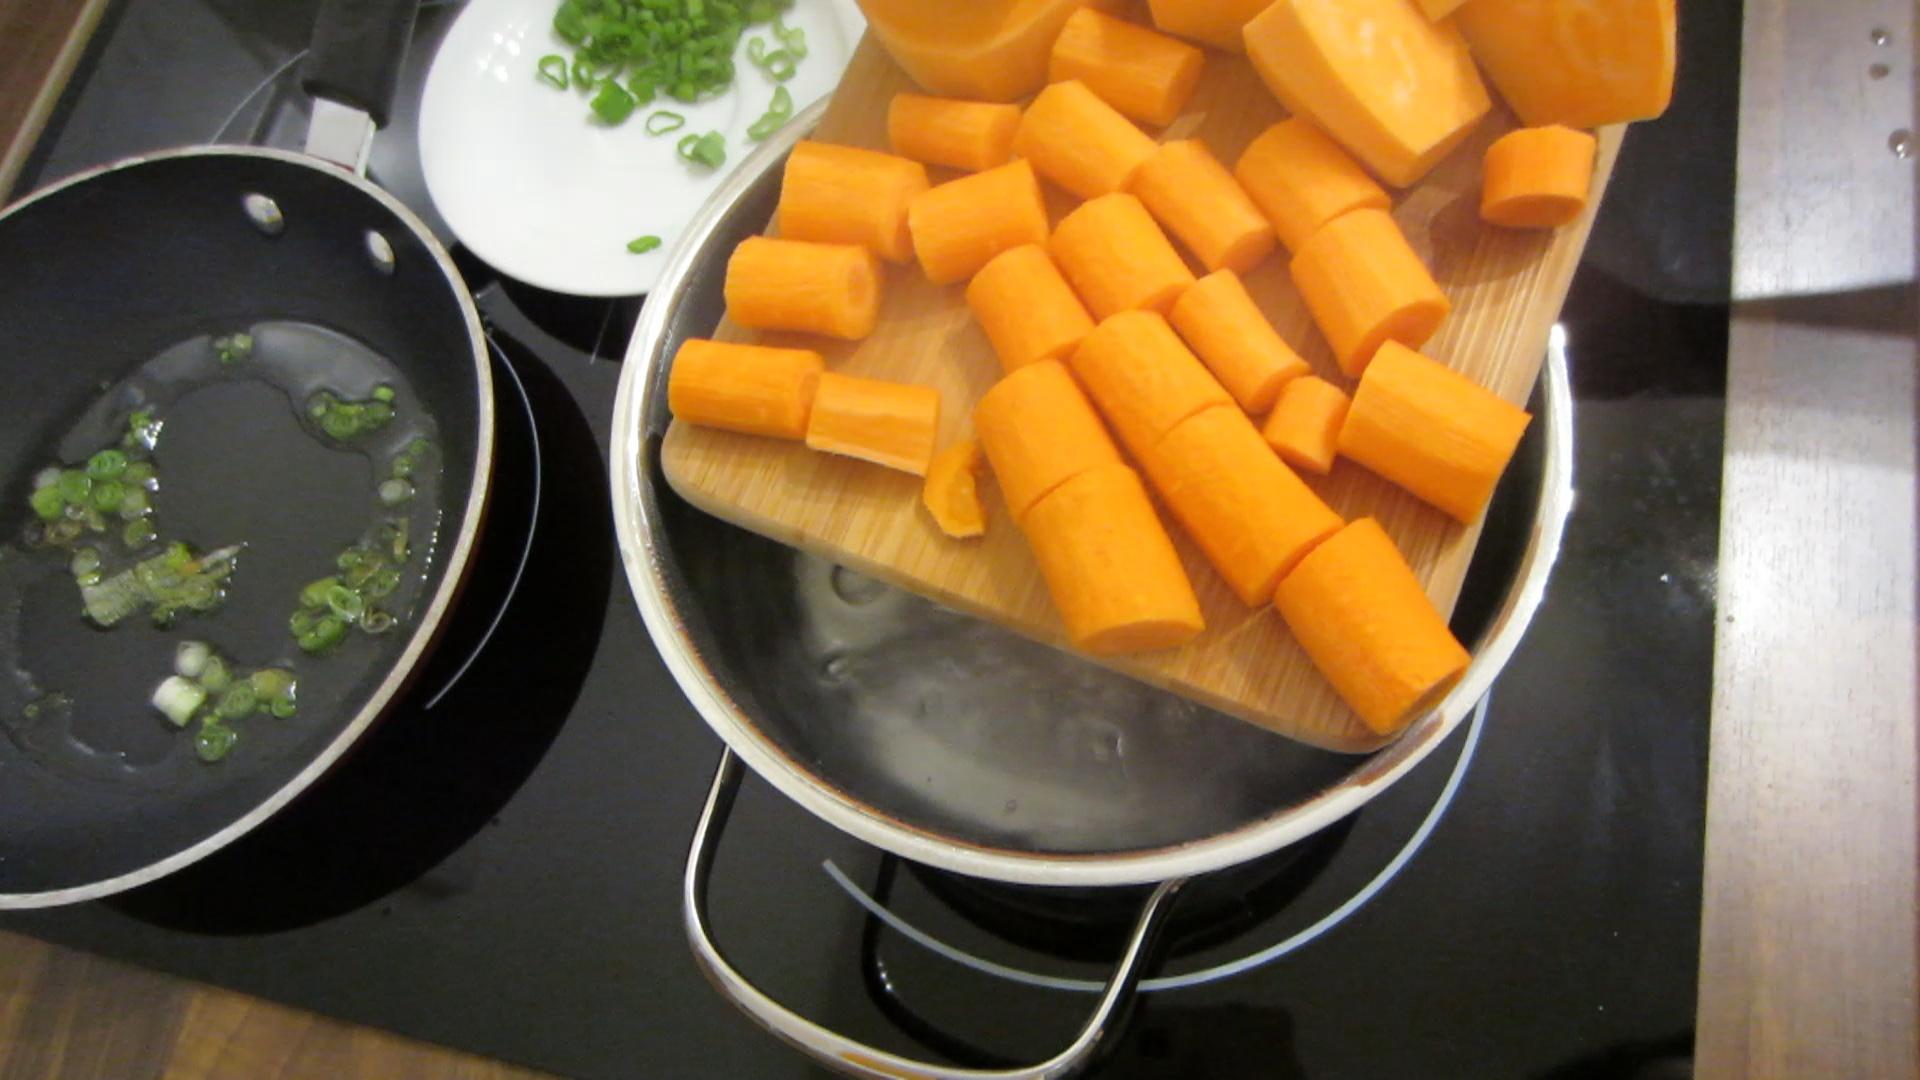 2014-04-11-Sweet-potato-carrot-mash-9.jpg